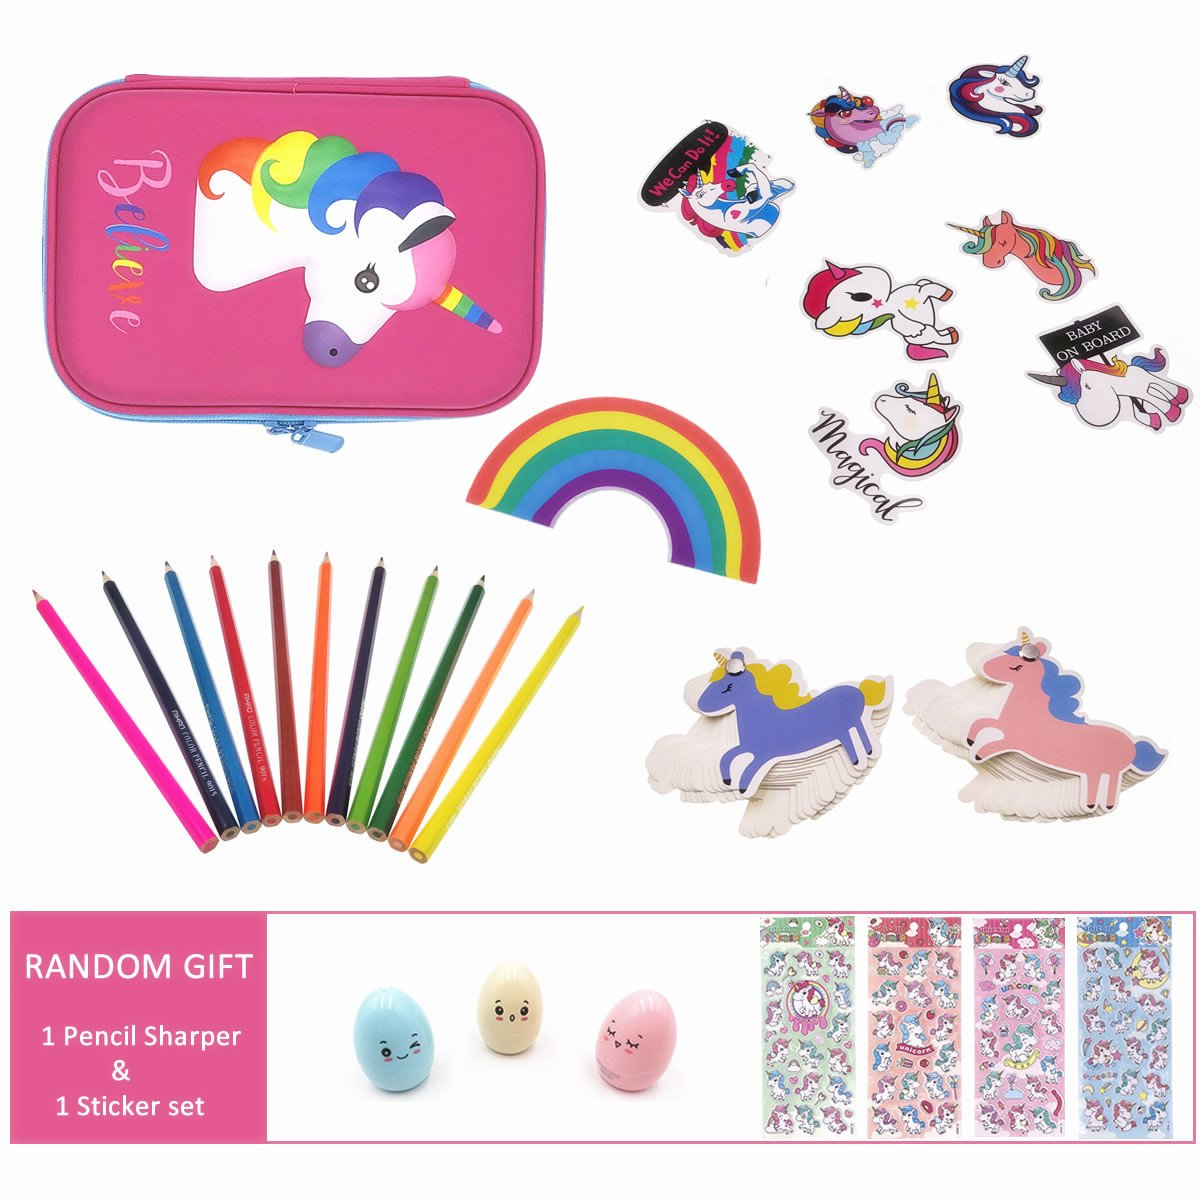 Cute Unicorn School Supplies for Girls, Unicorn Stationery, Unicorn Pencil Case, Pencils, Stickers and Rainbow Eraser